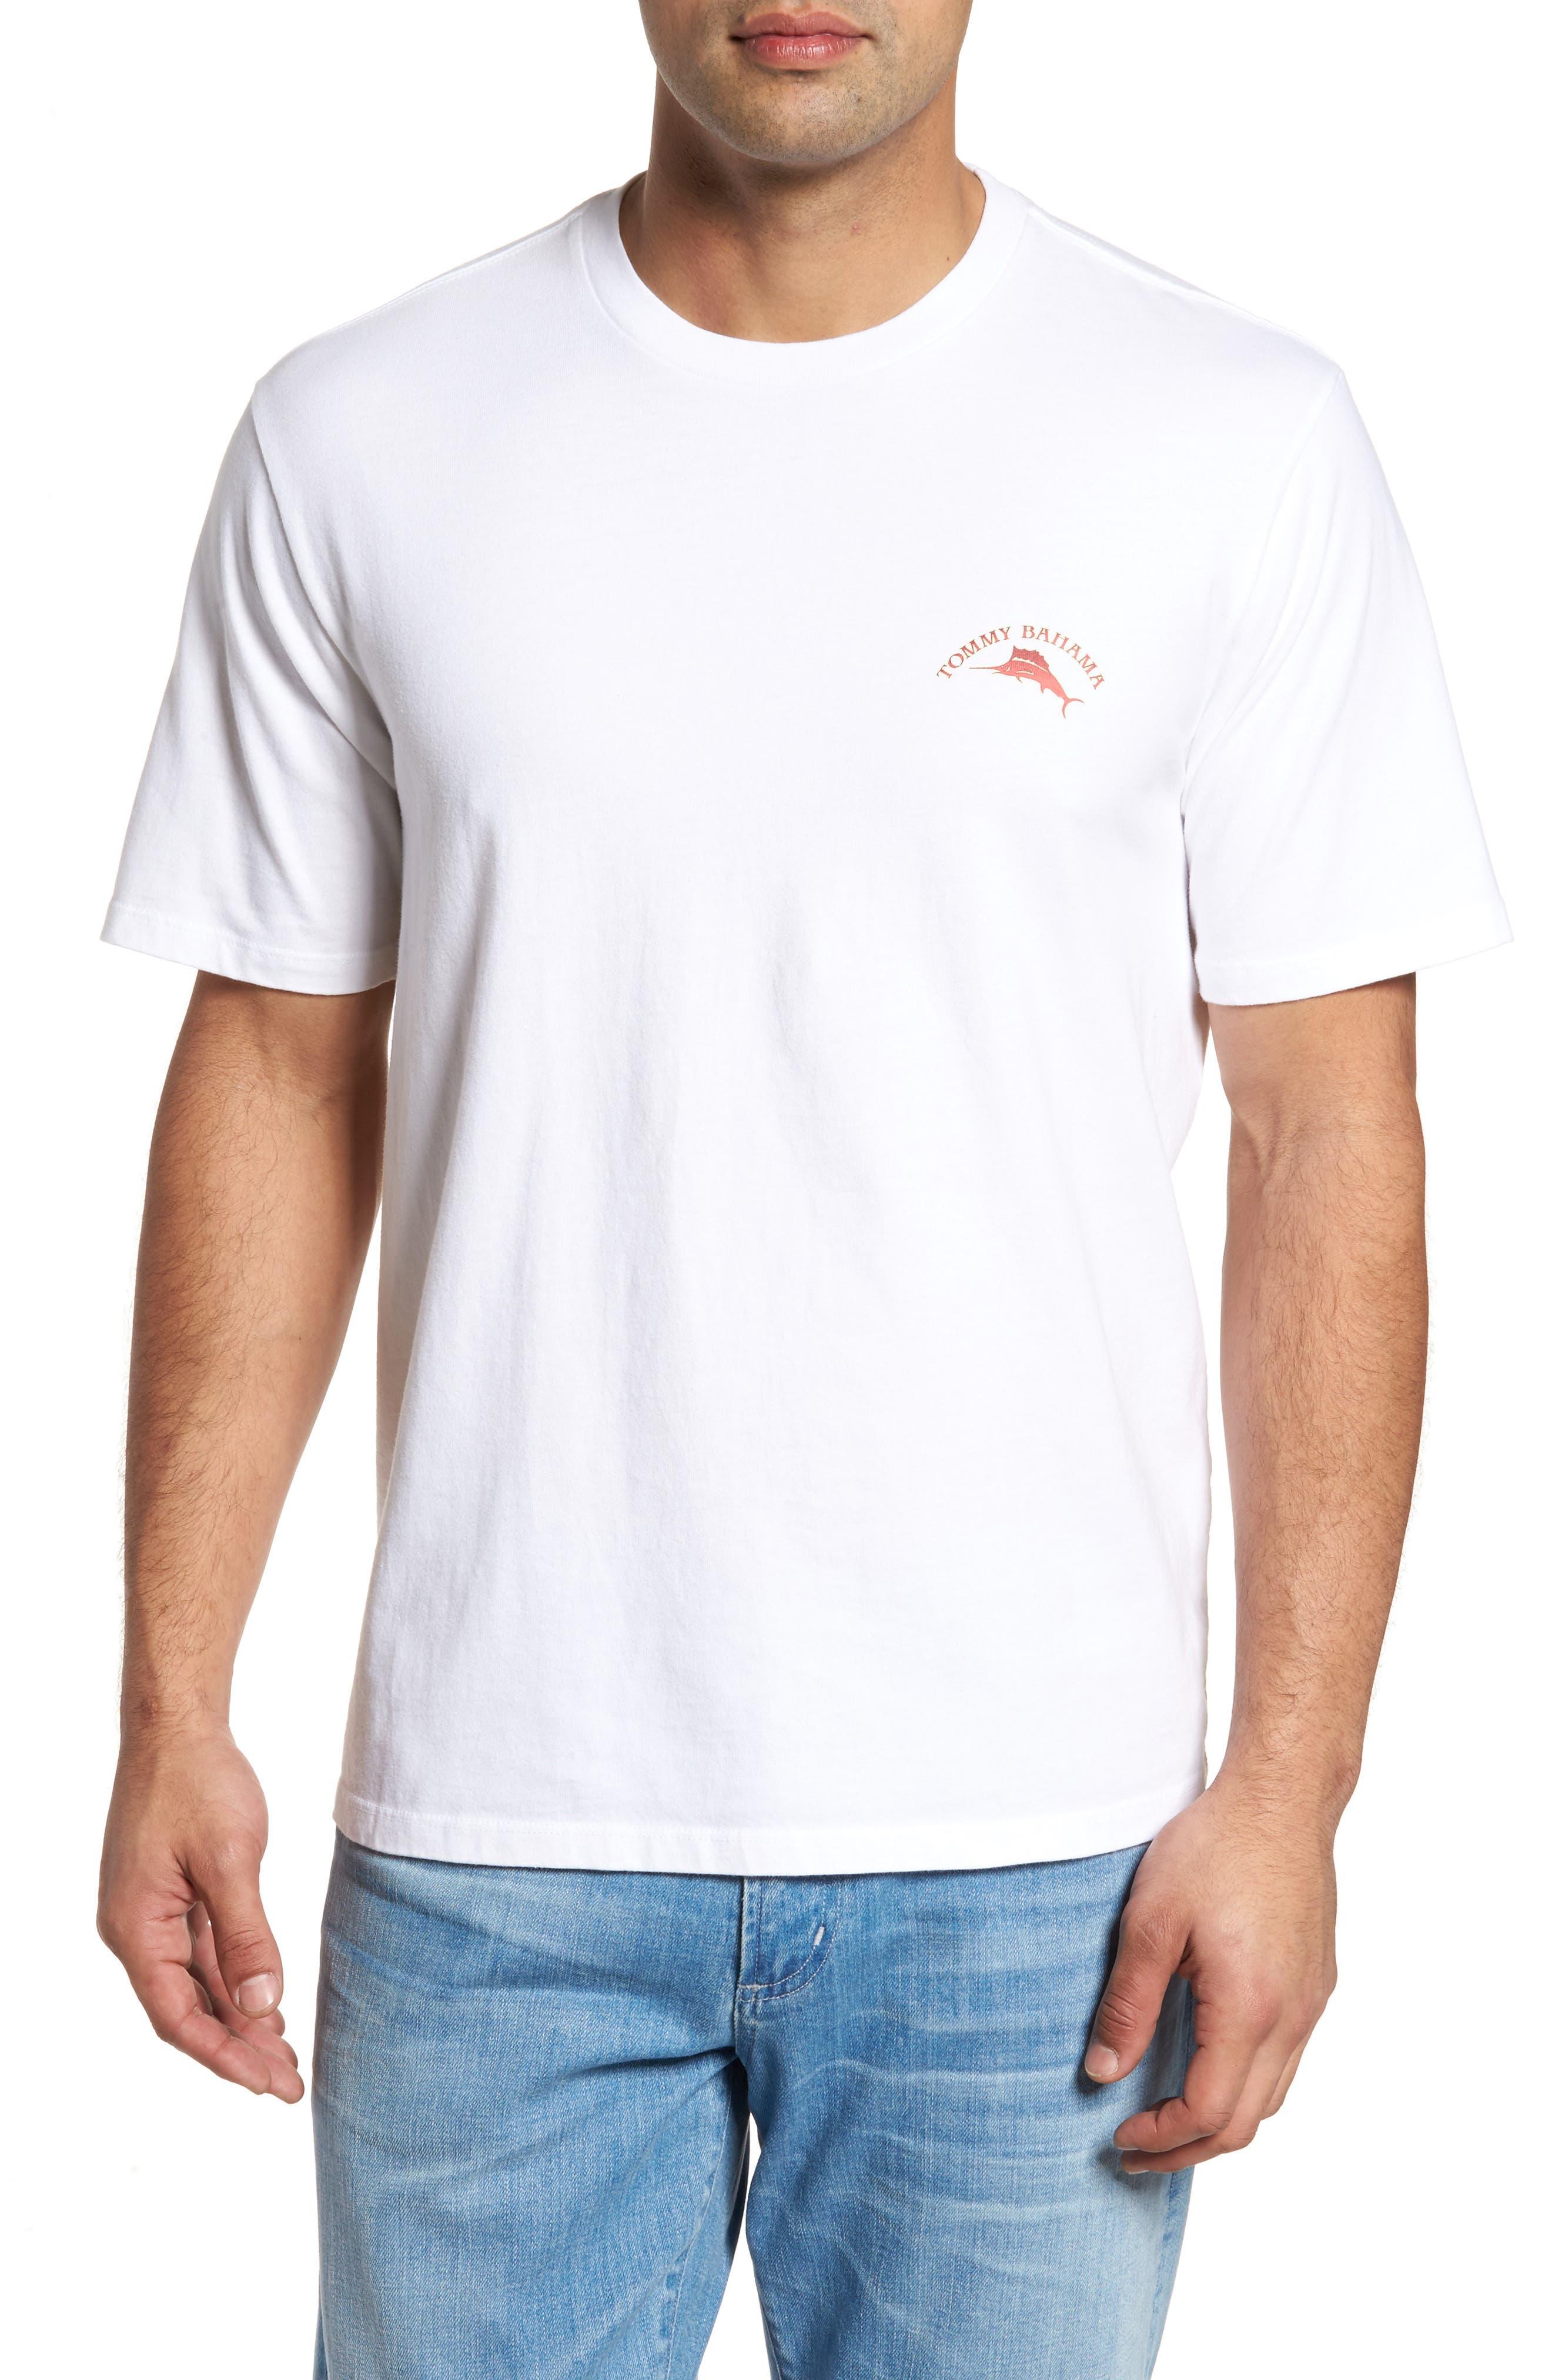 Zinspiration Graphic T-Shirt,                         Main,                         color, 100